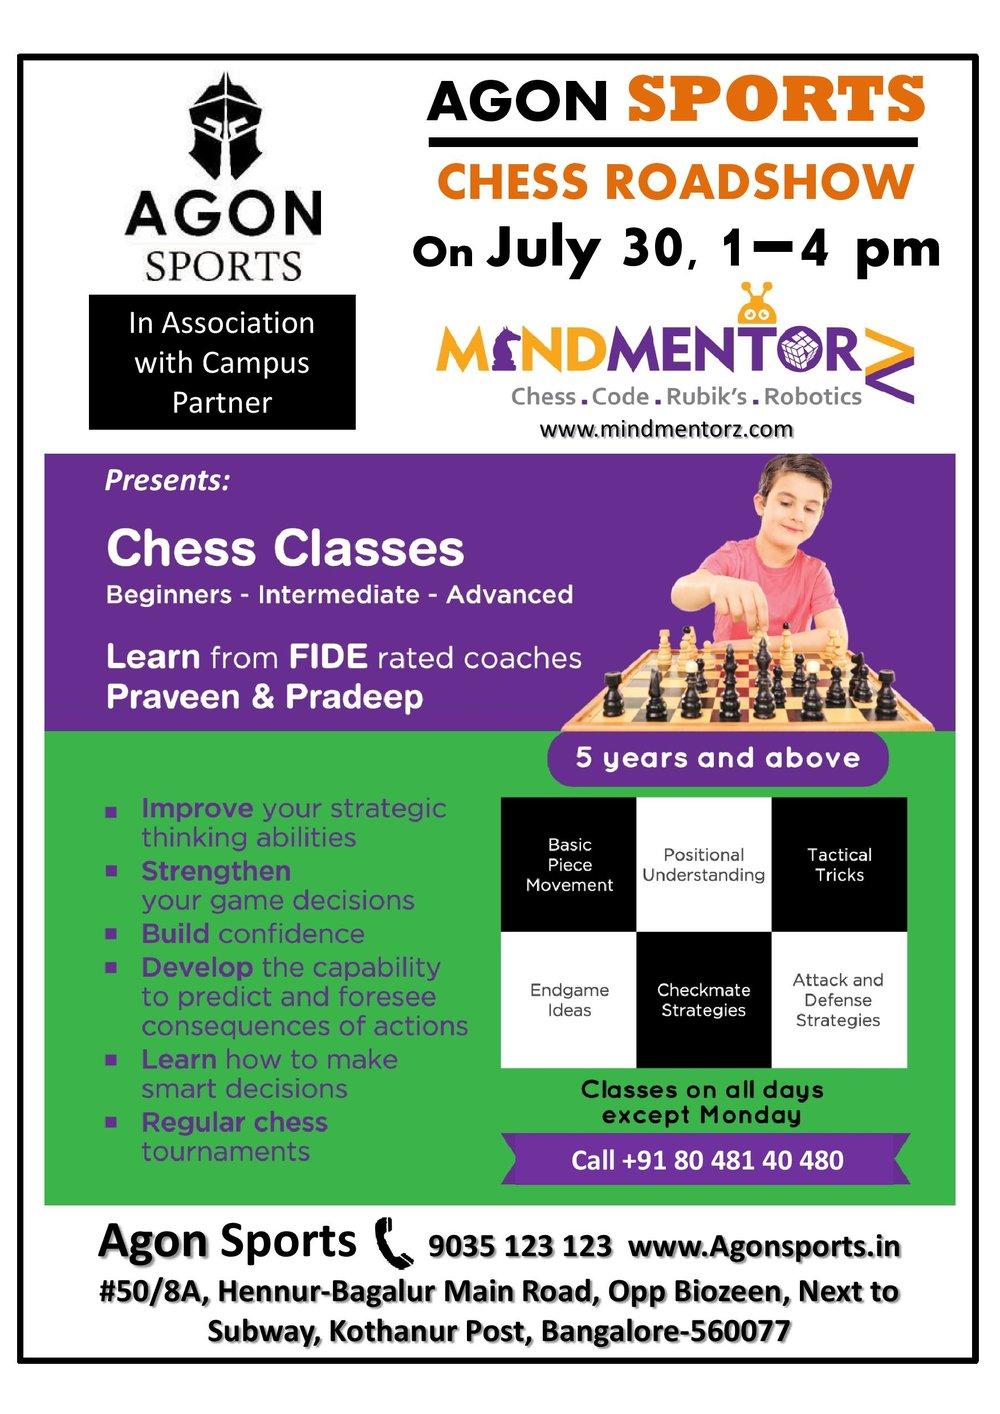 Chess Roadshow @ Agon-page-001.jpg